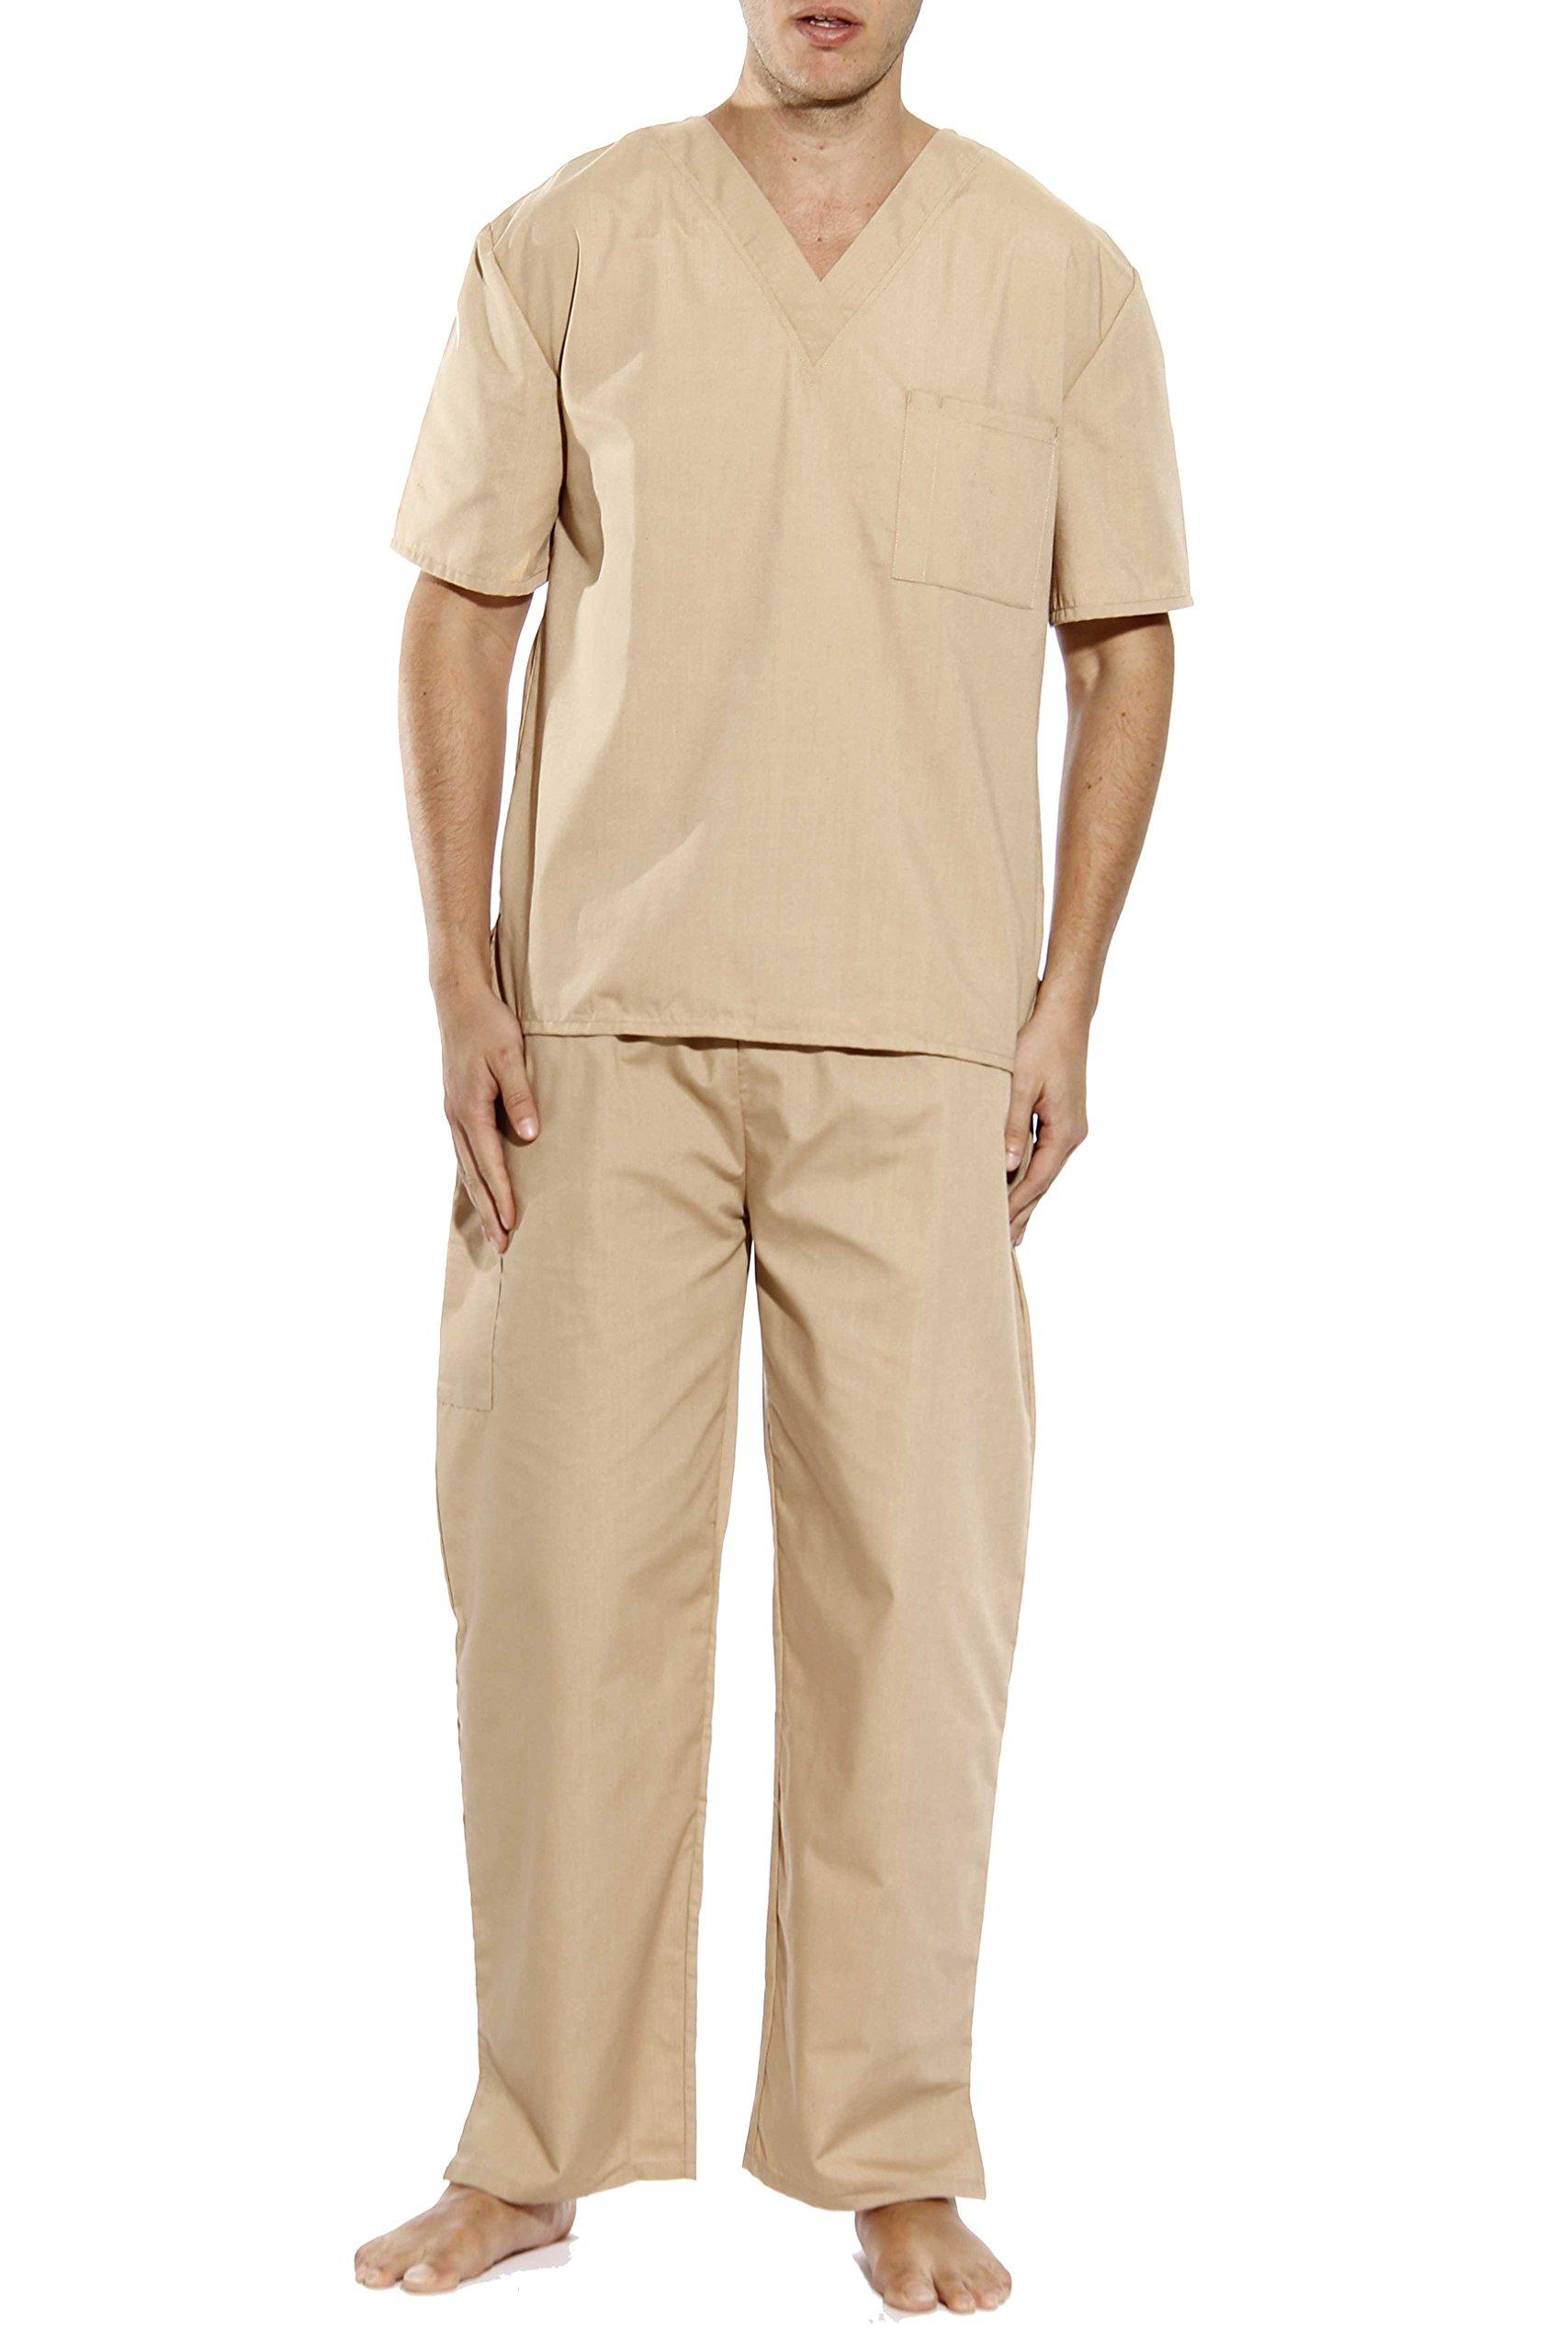 33000M-Khaki-XXL Tropi Unisex Scrub Sets / Medical Scrubs / Nursing Scrubs by Tropi (Image #1)